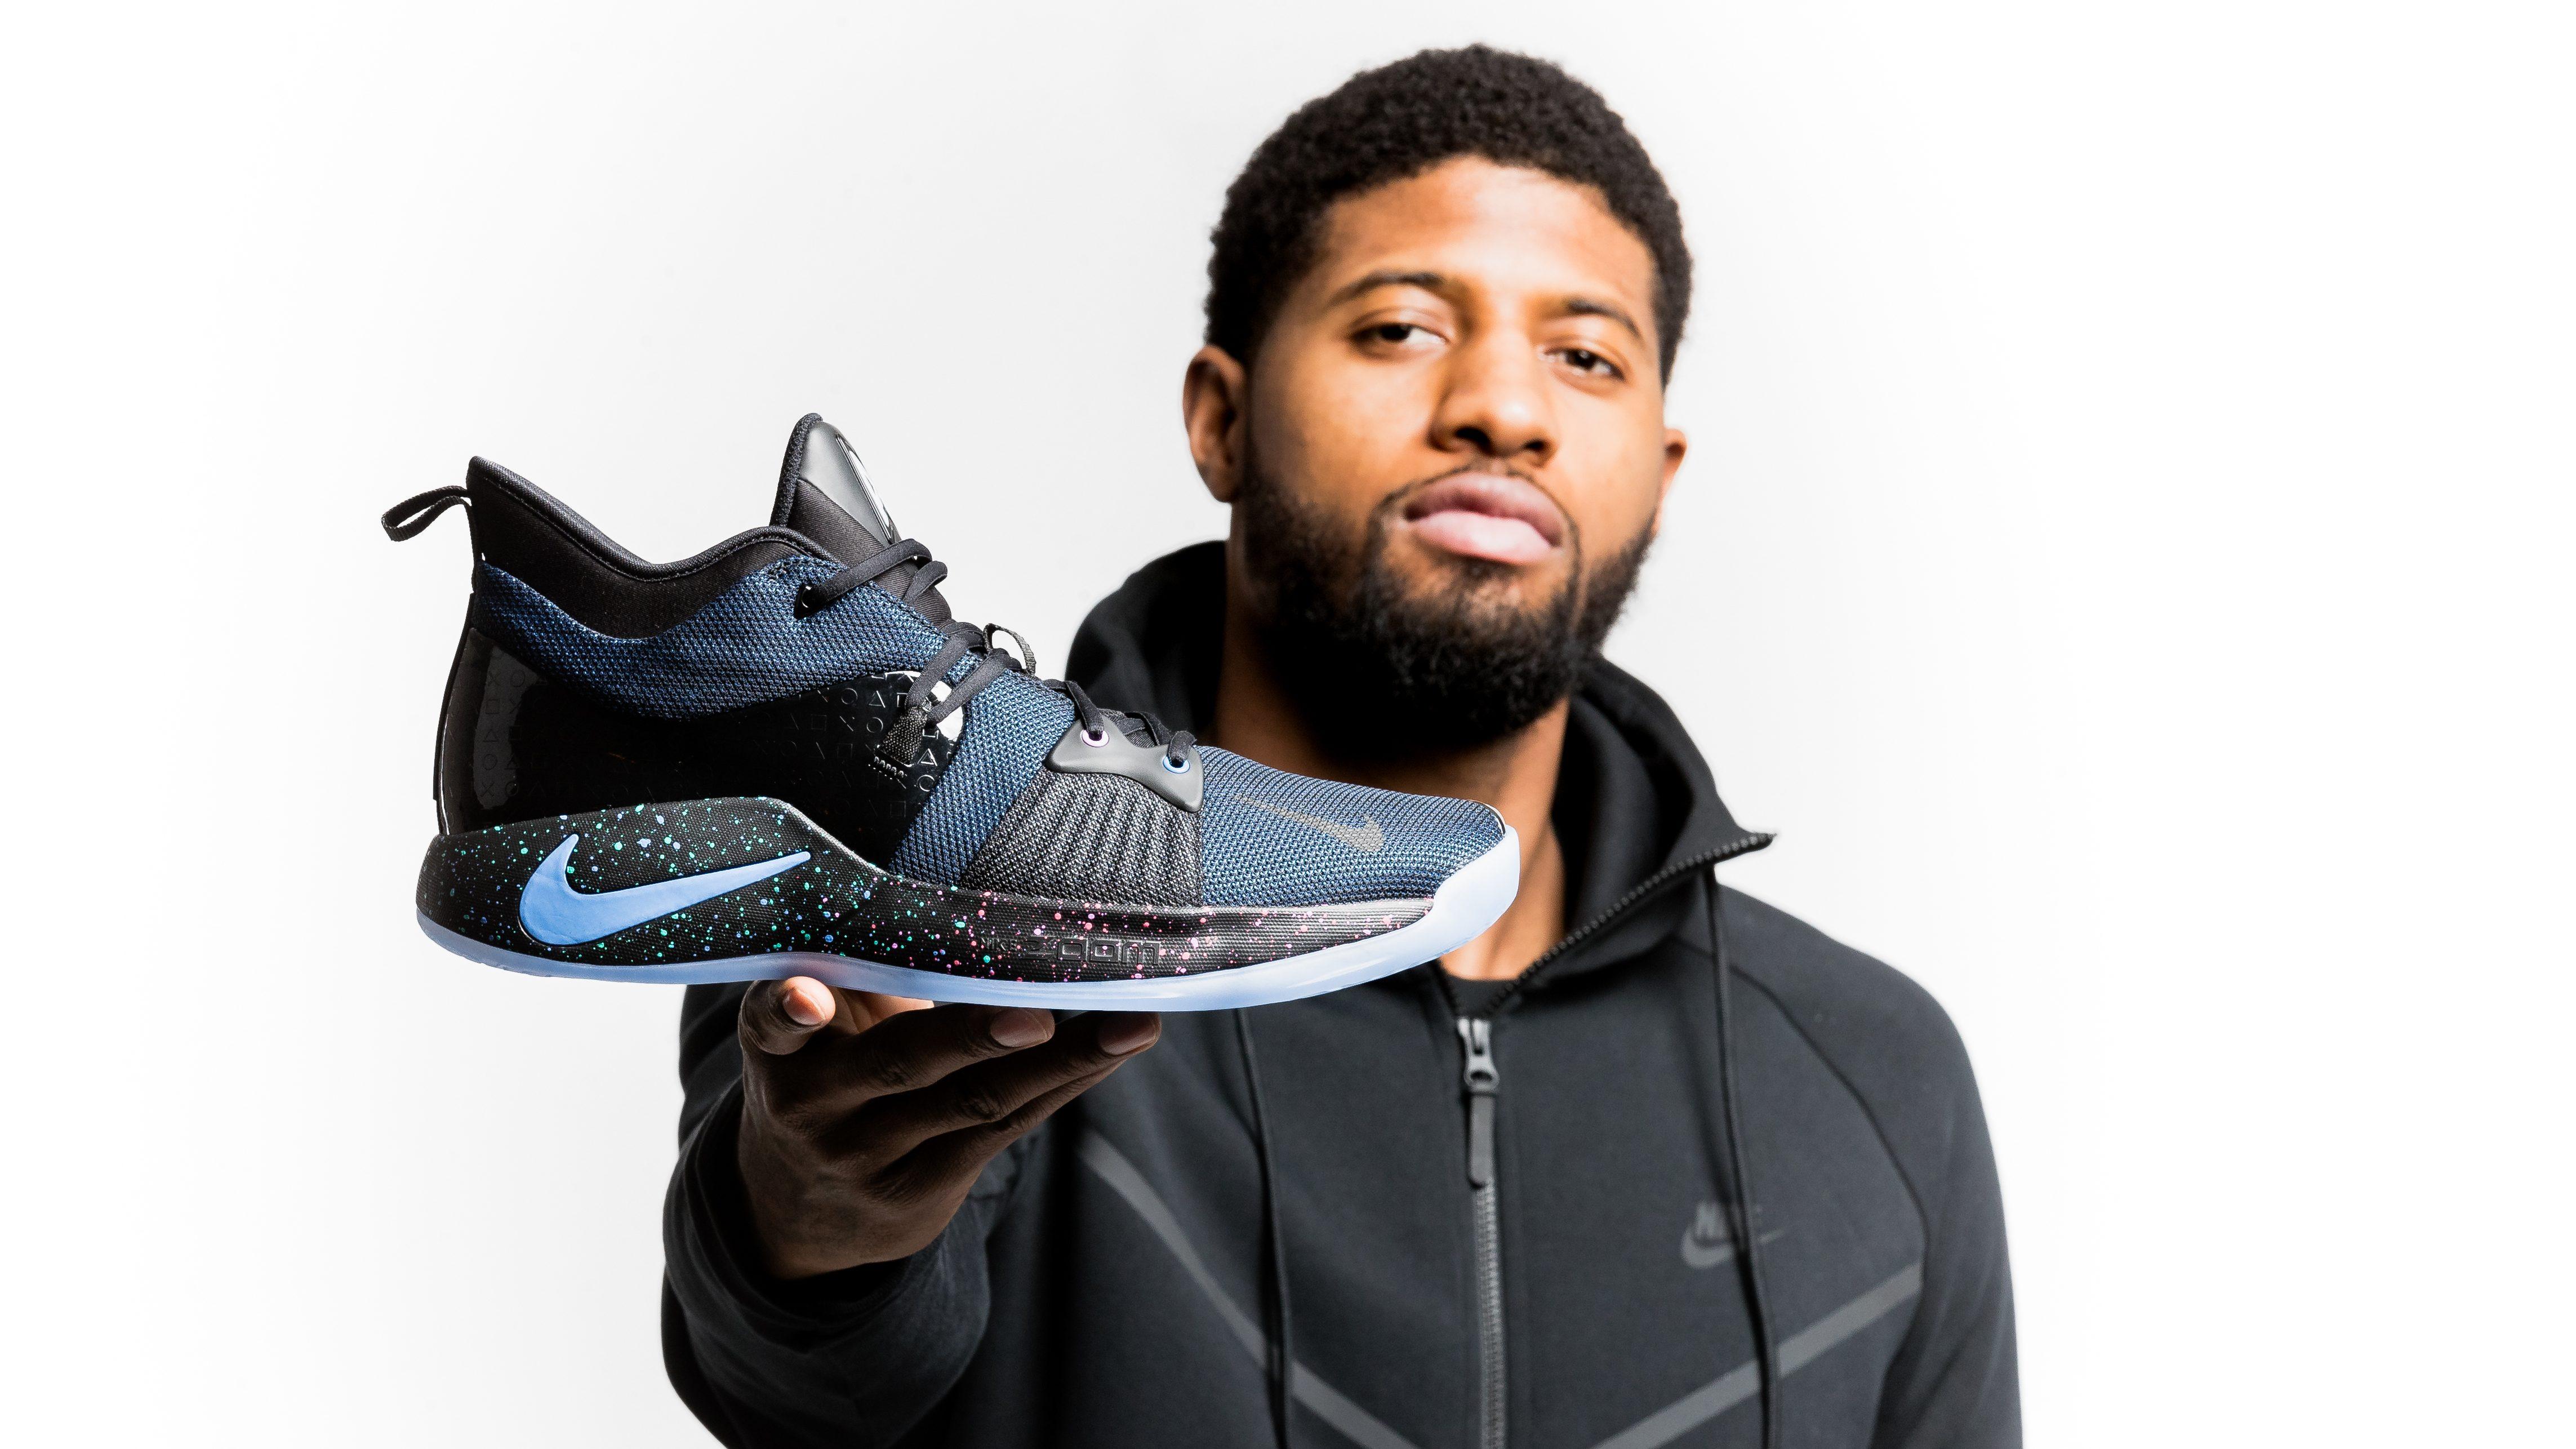 signature sneaker — the Nike PG2